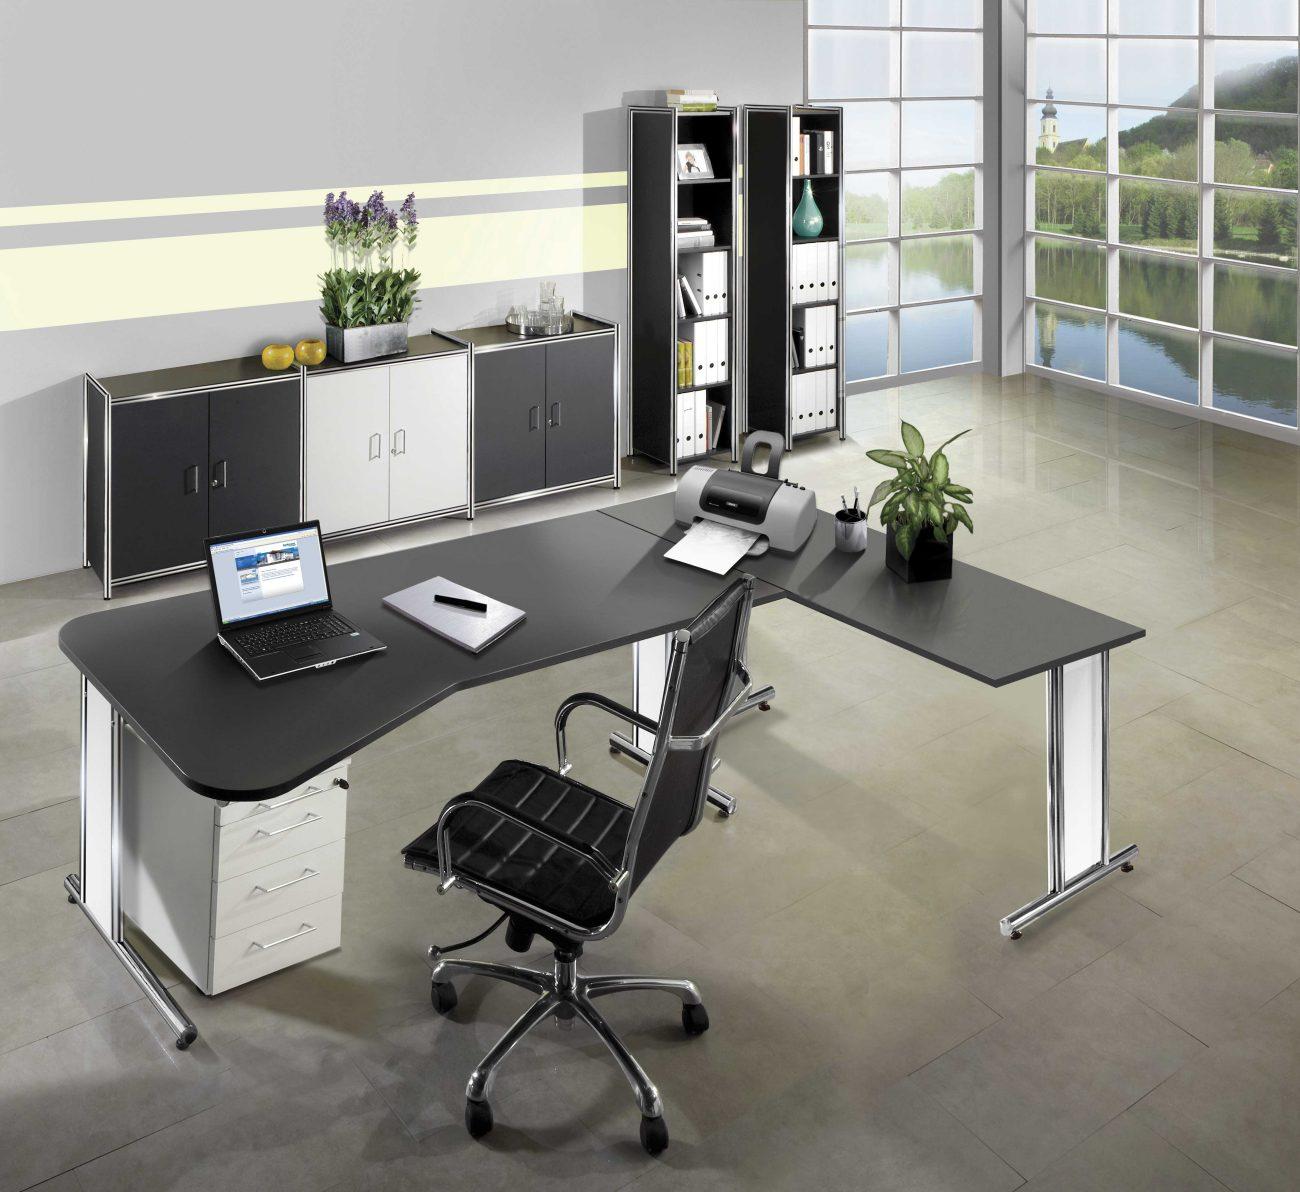 Moderne büromöbel  Moderne Büromöbel ~ Dekoration, Inspiration Innenraum und Möbel Ideen